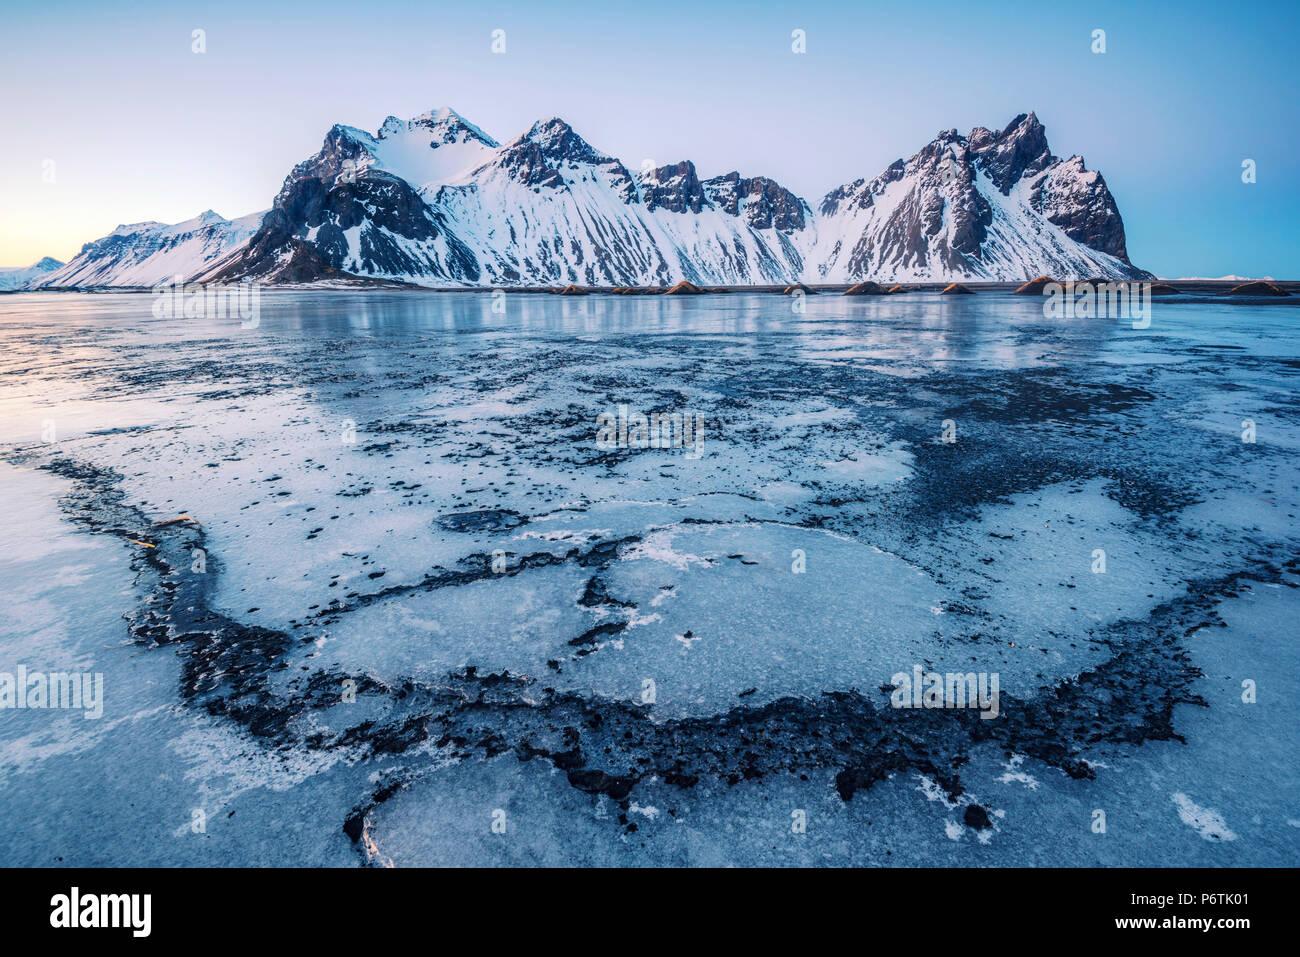 Stokksnes, Eastern Iceland, Europe. Vestrahorn mountain in a frozen winter landscape. - Stock Image